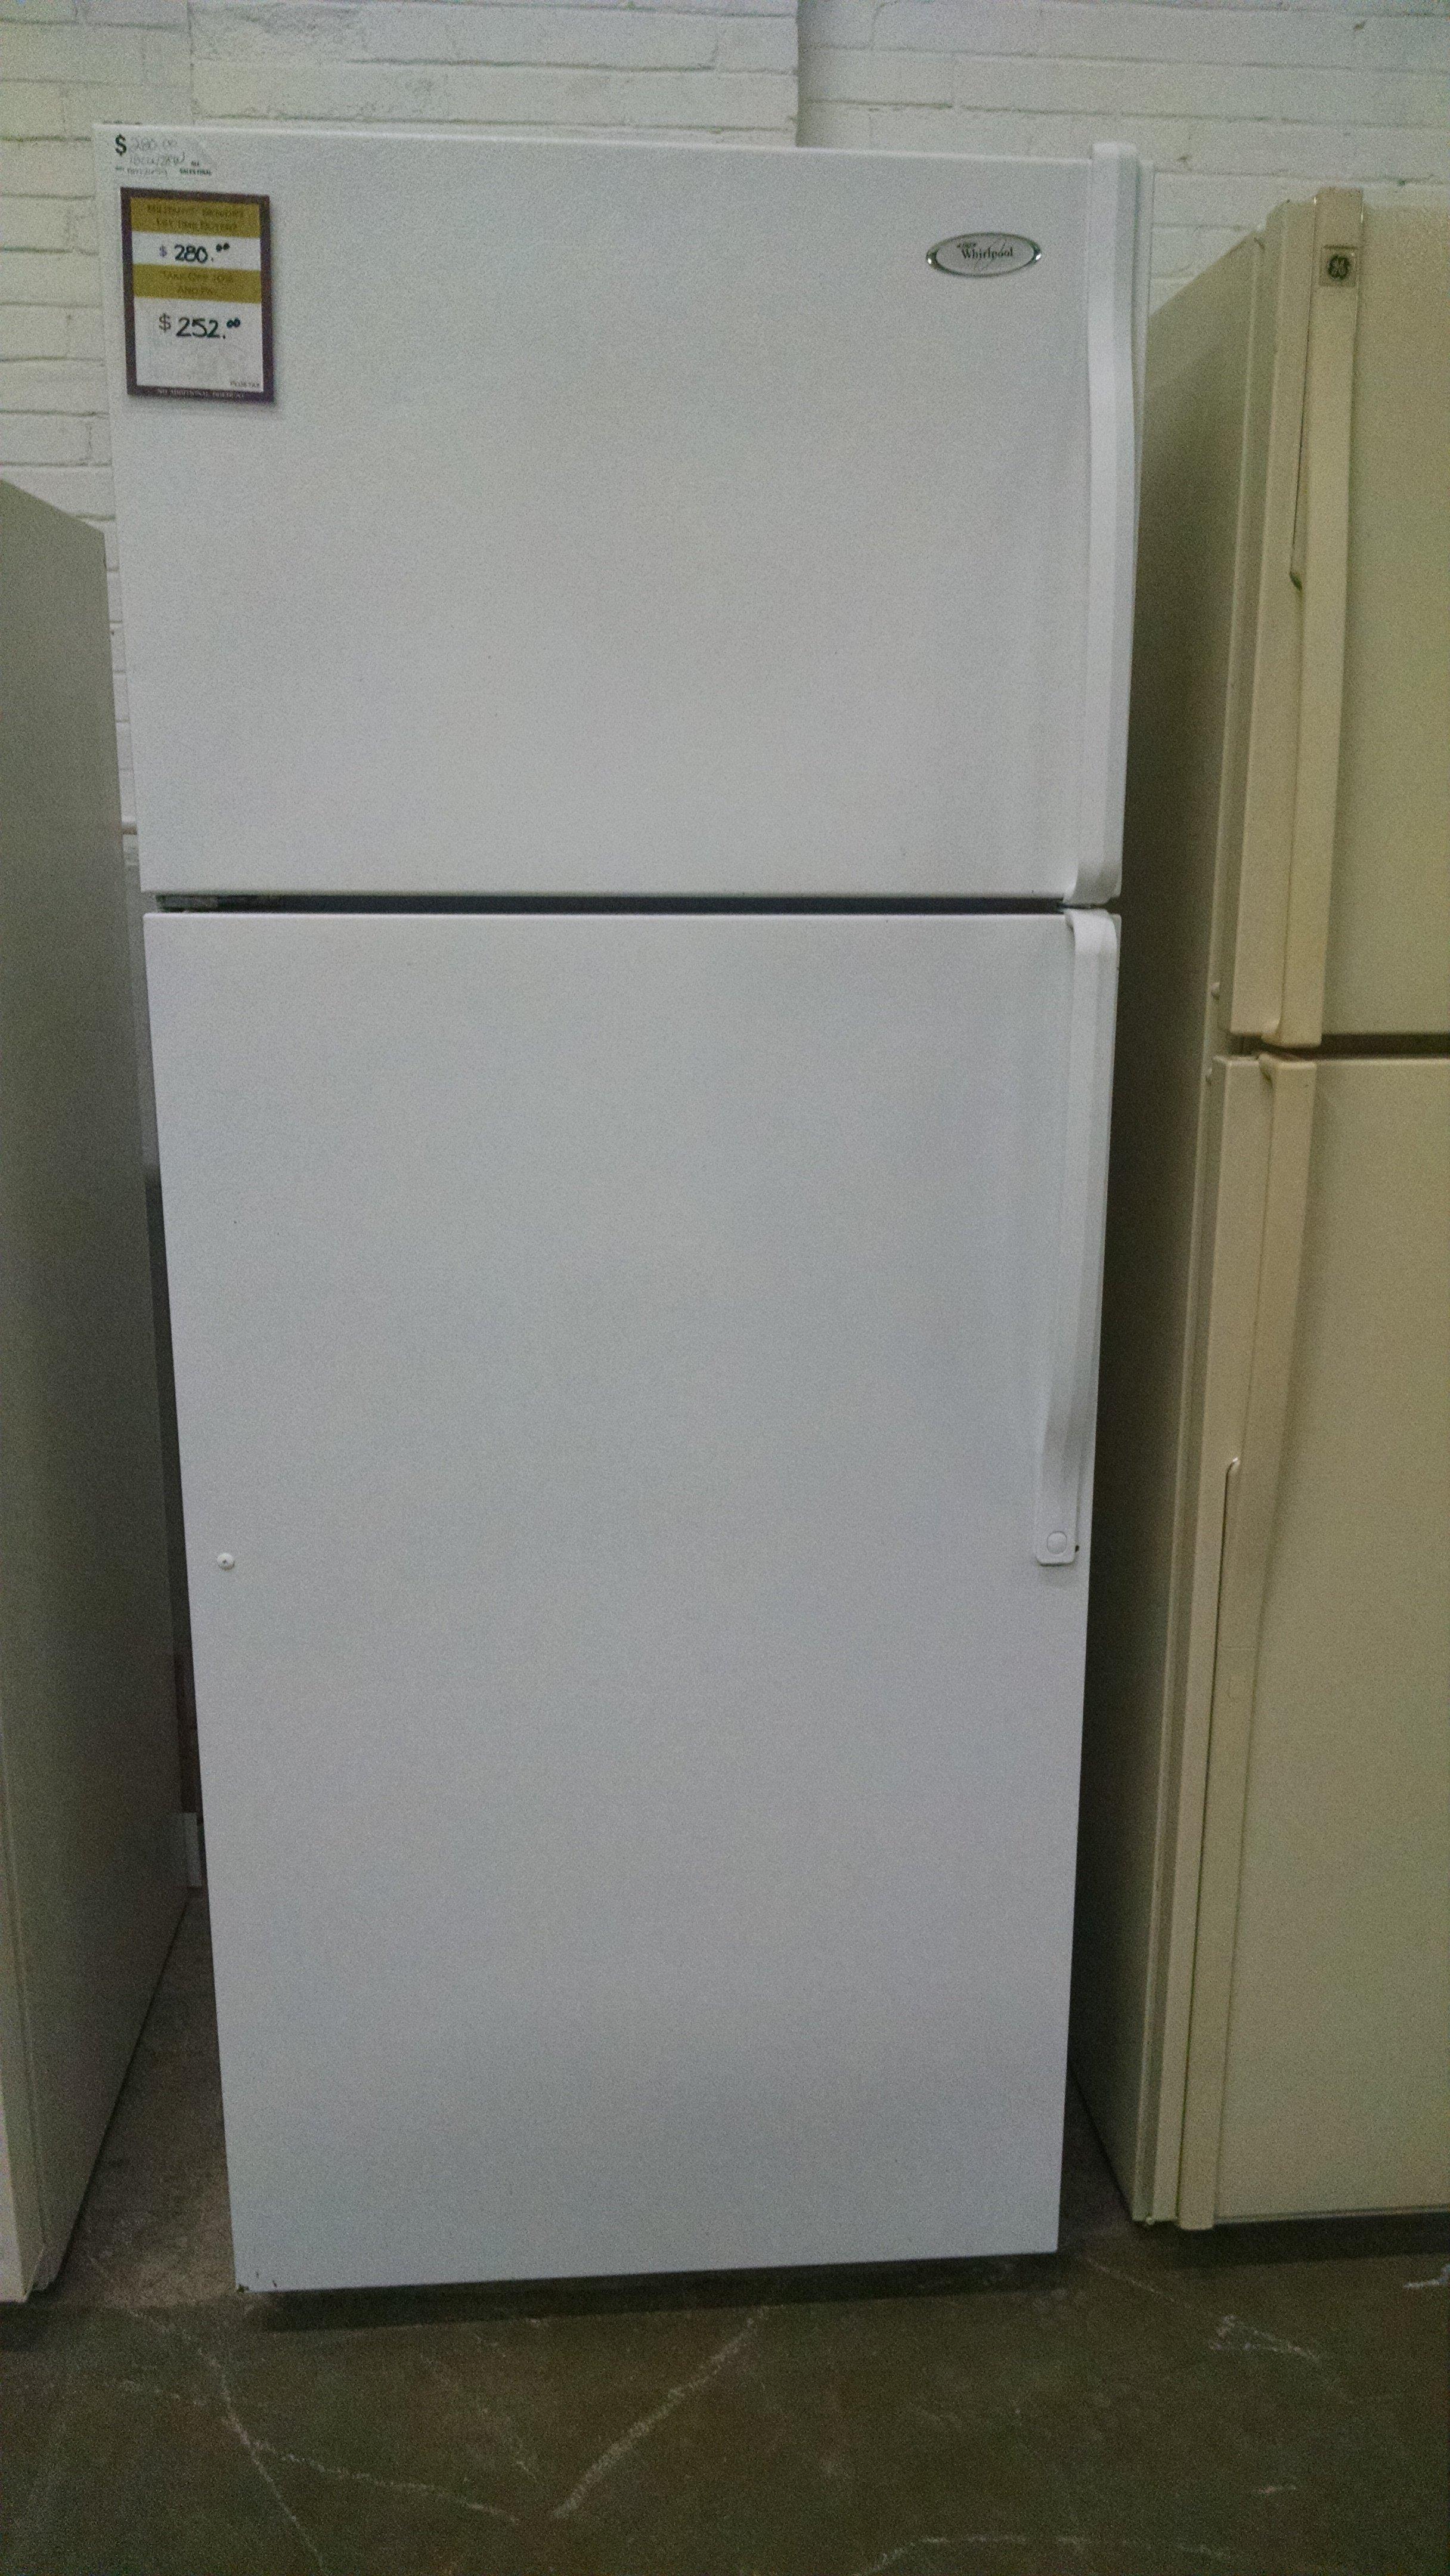 Whirlpool topmount refrigerator